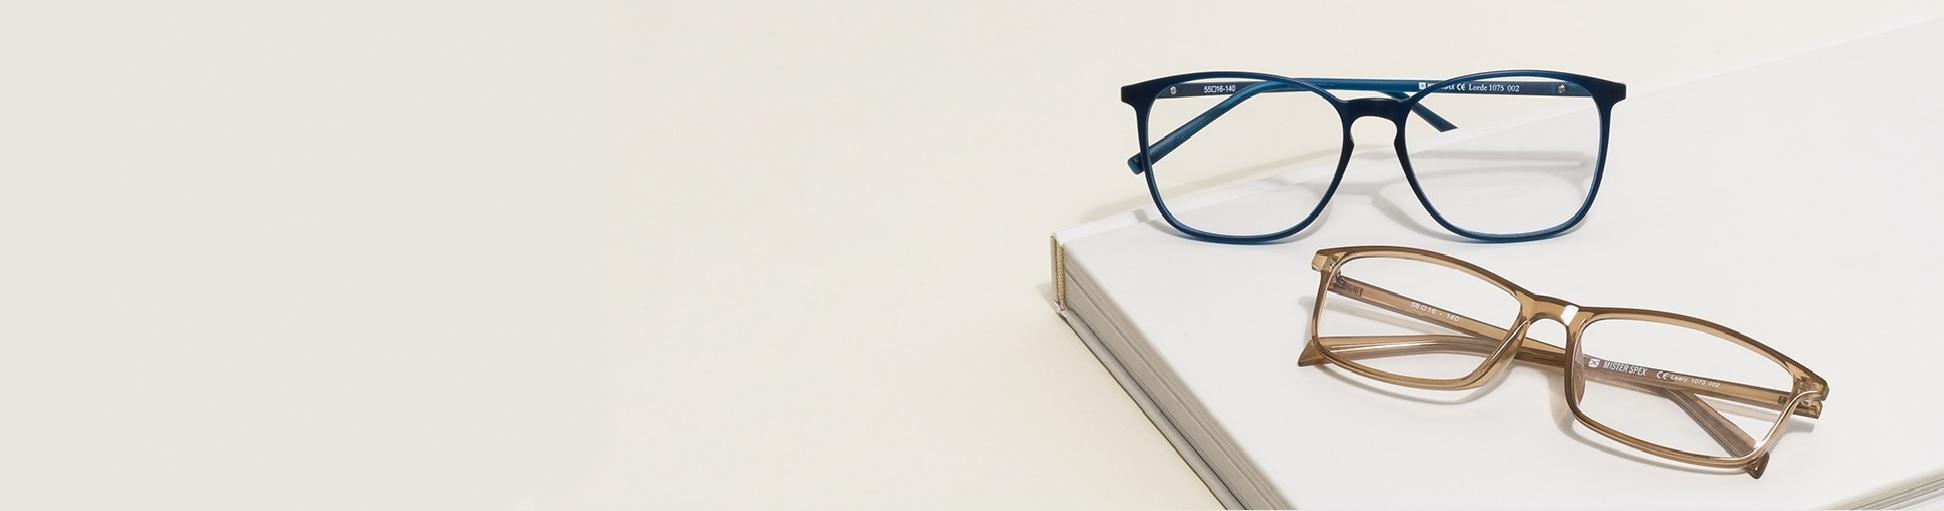 e2145eebe3 Varifocal Glasses - Buy Varifocals online at Mister Spex UK